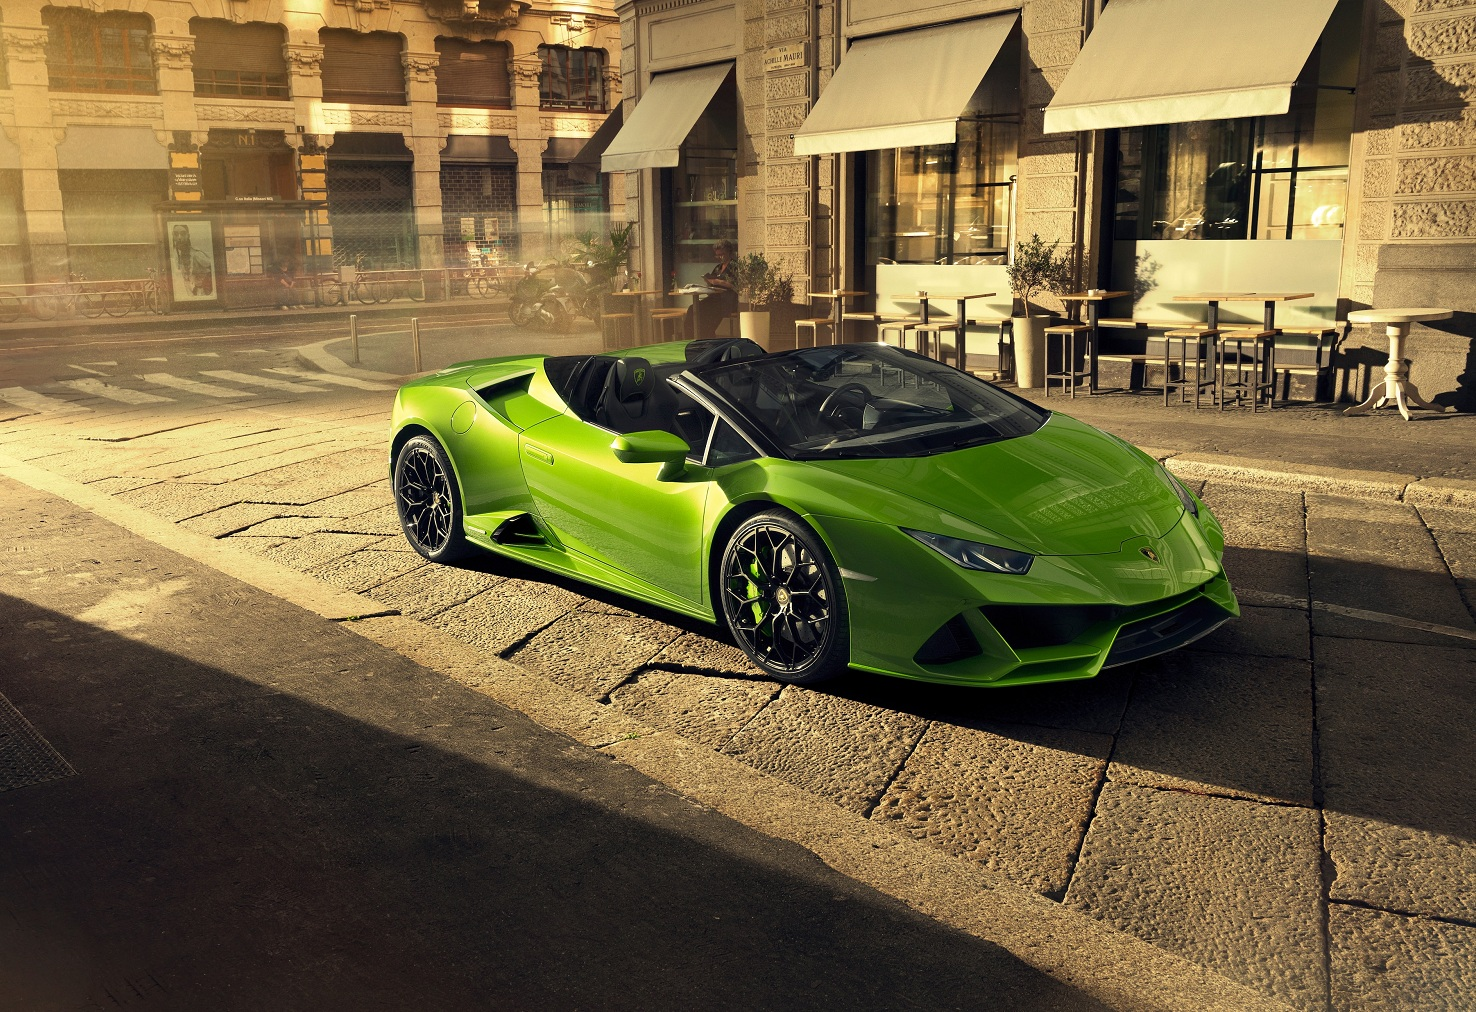 В Украине появился новейший суперкар Lamborghini